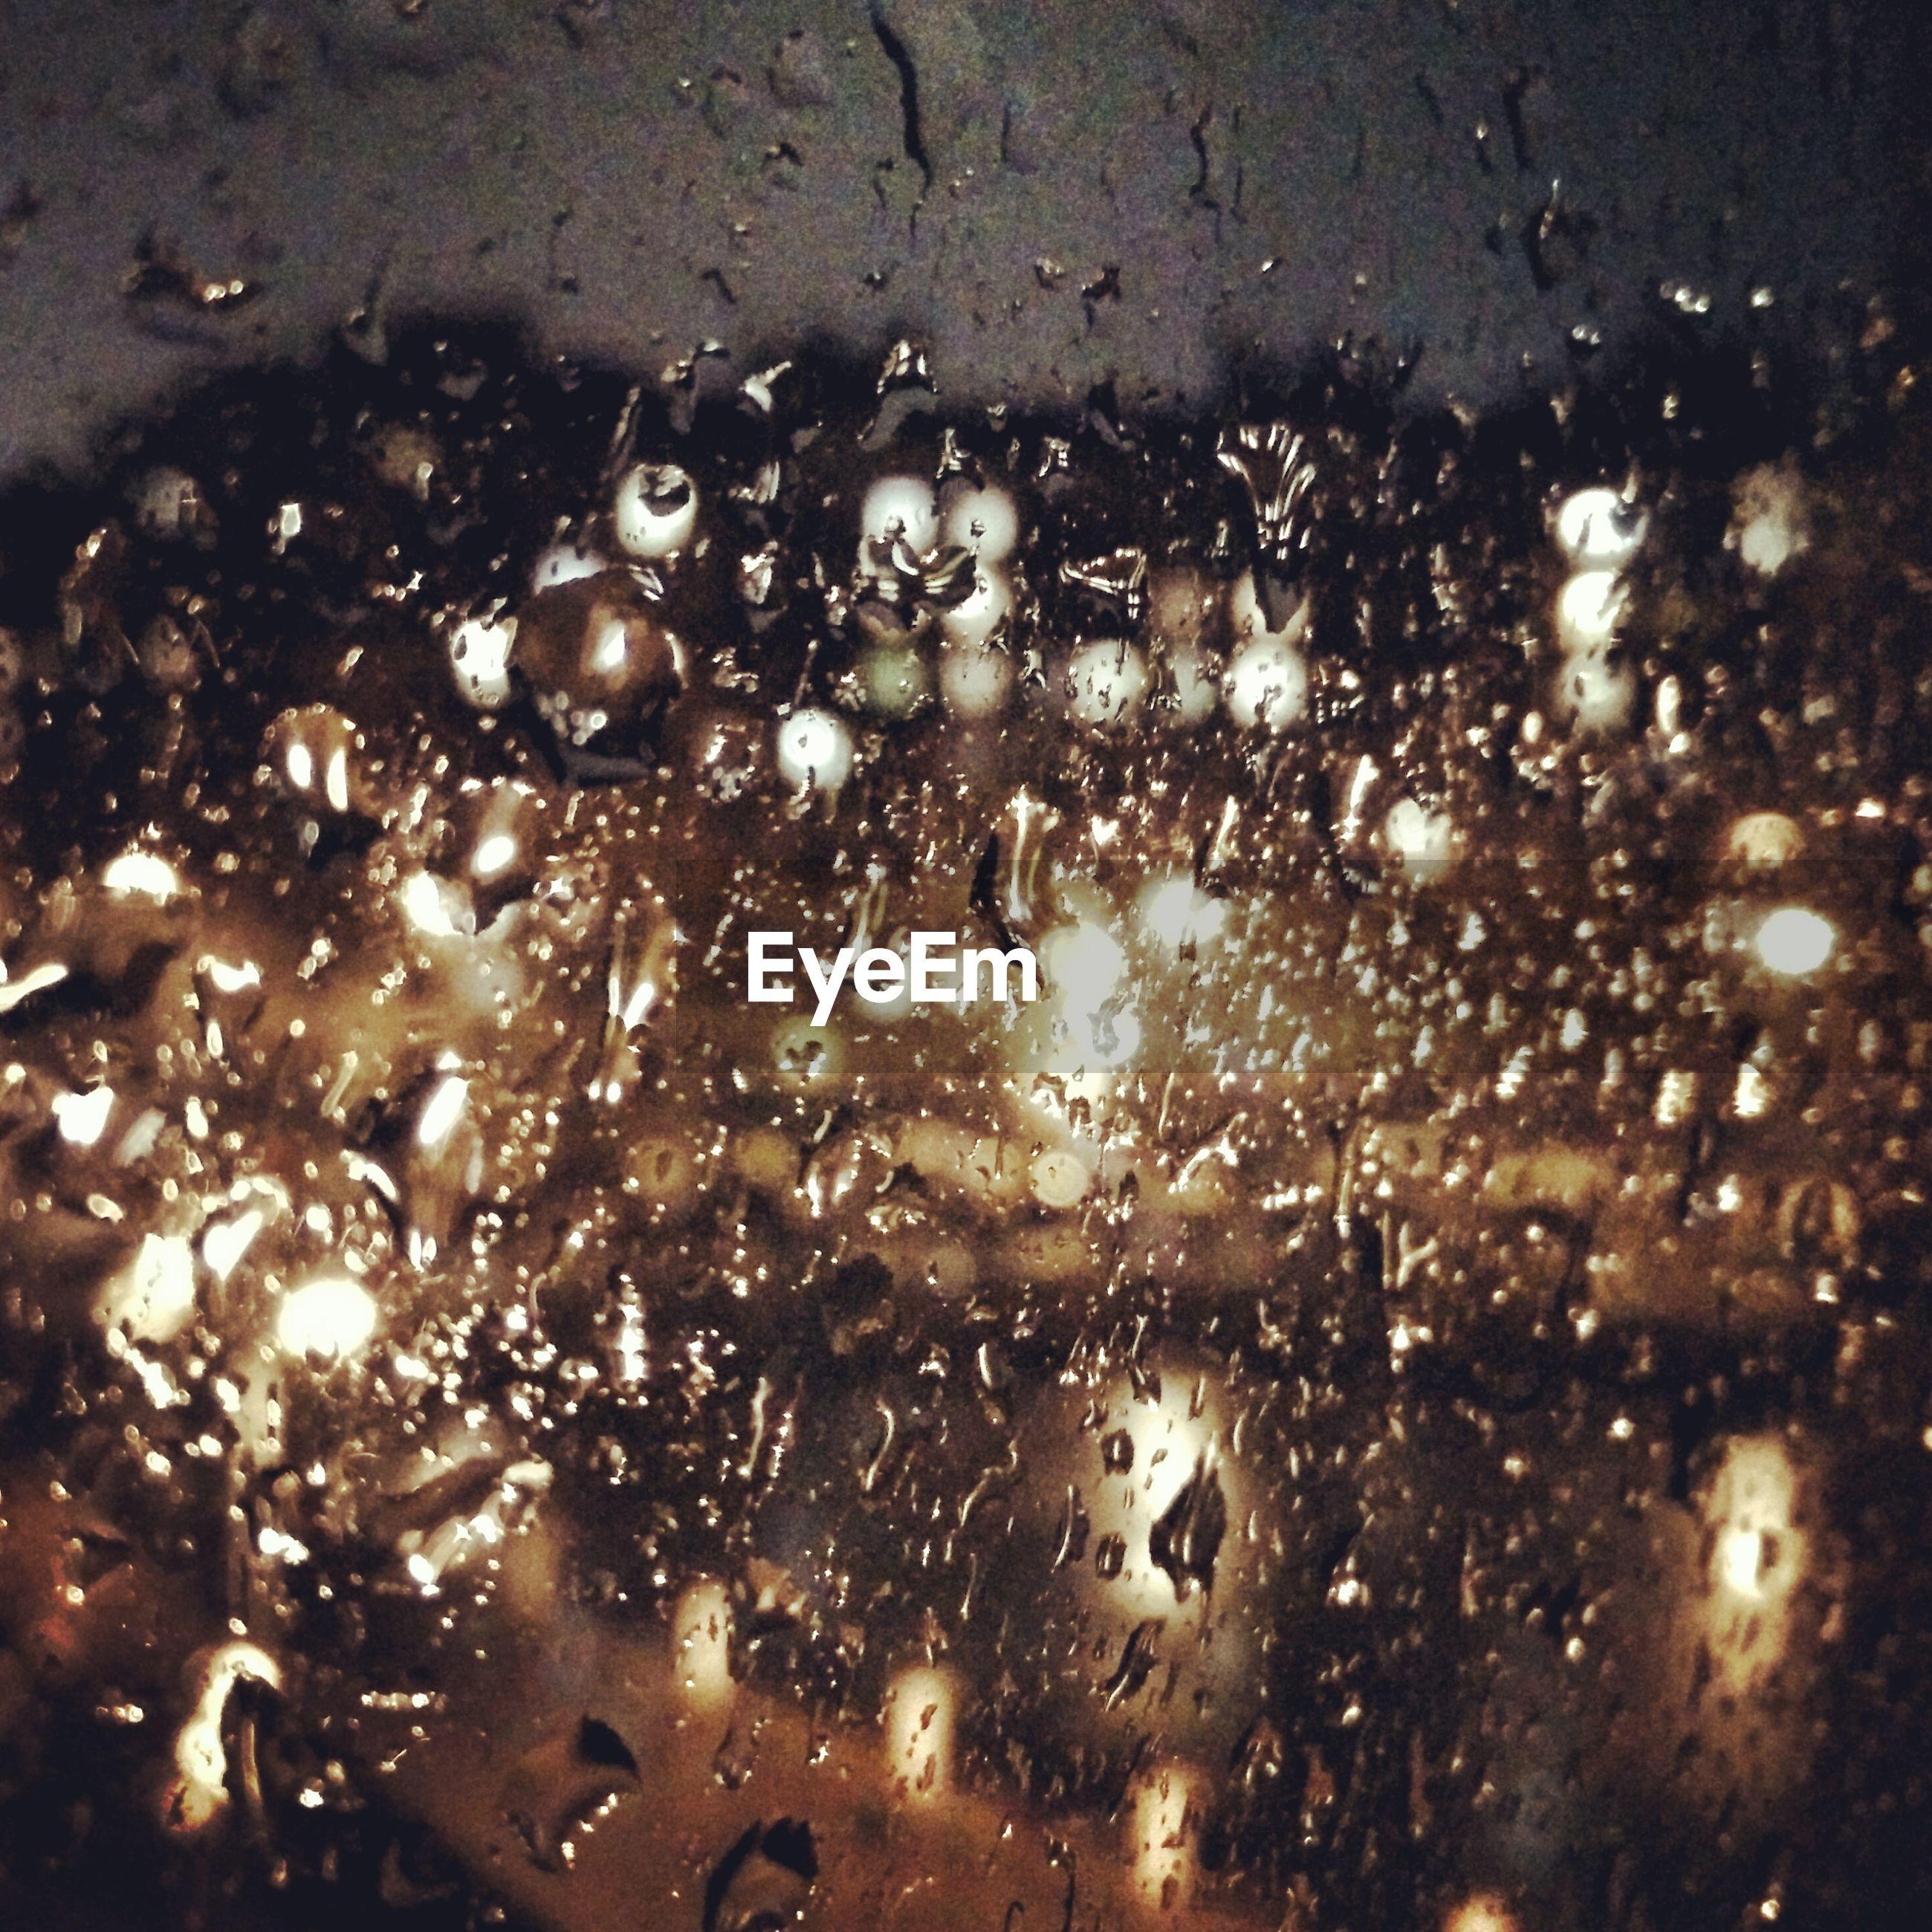 wet, drop, water, rain, full frame, indoors, backgrounds, window, glass - material, raindrop, transparent, weather, glass, season, illuminated, night, monsoon, no people, close-up, pattern